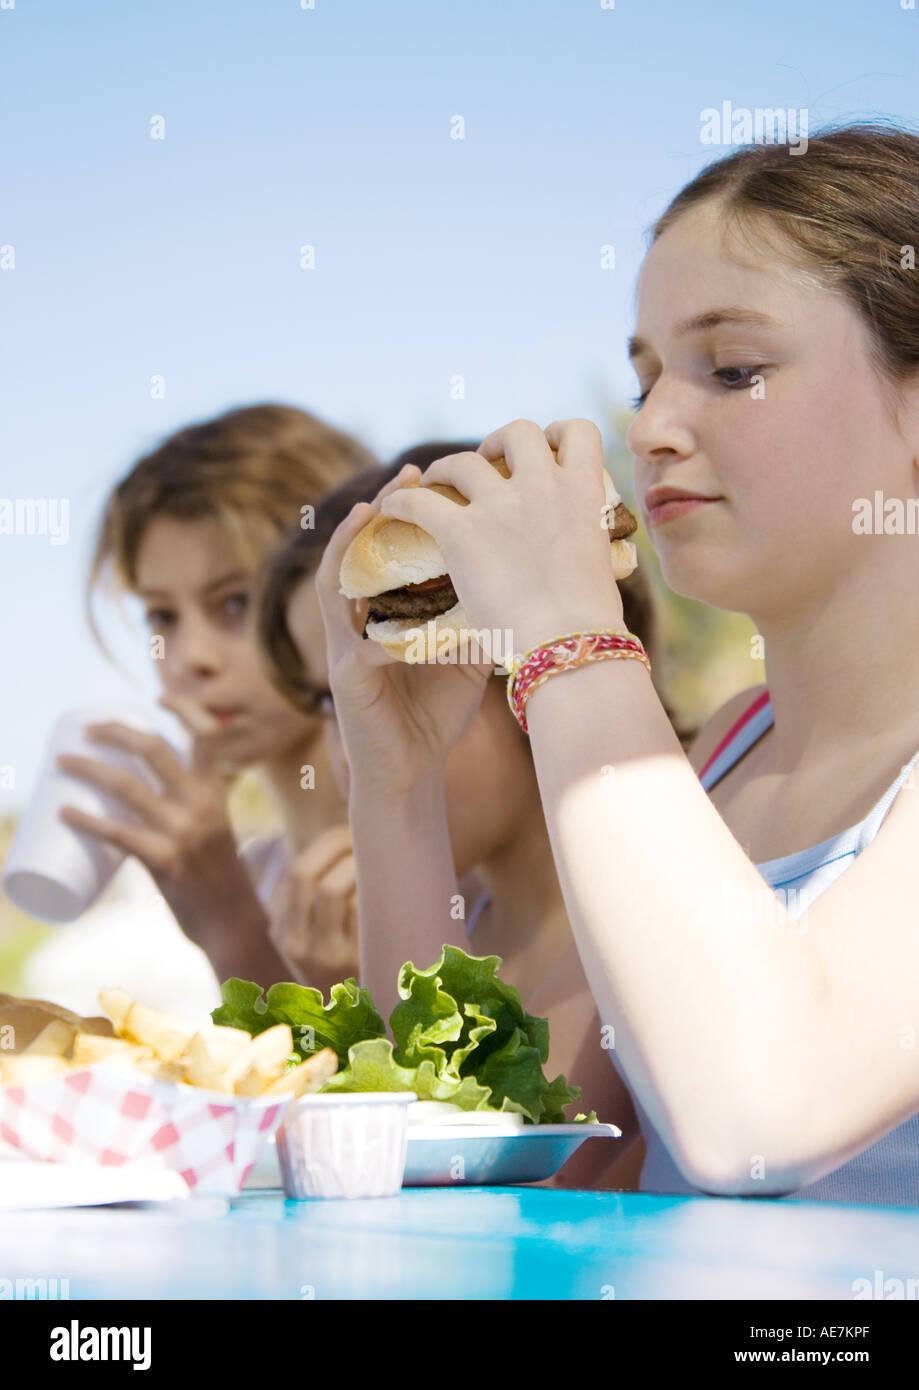 Kids eating hamburgers - Stock Image